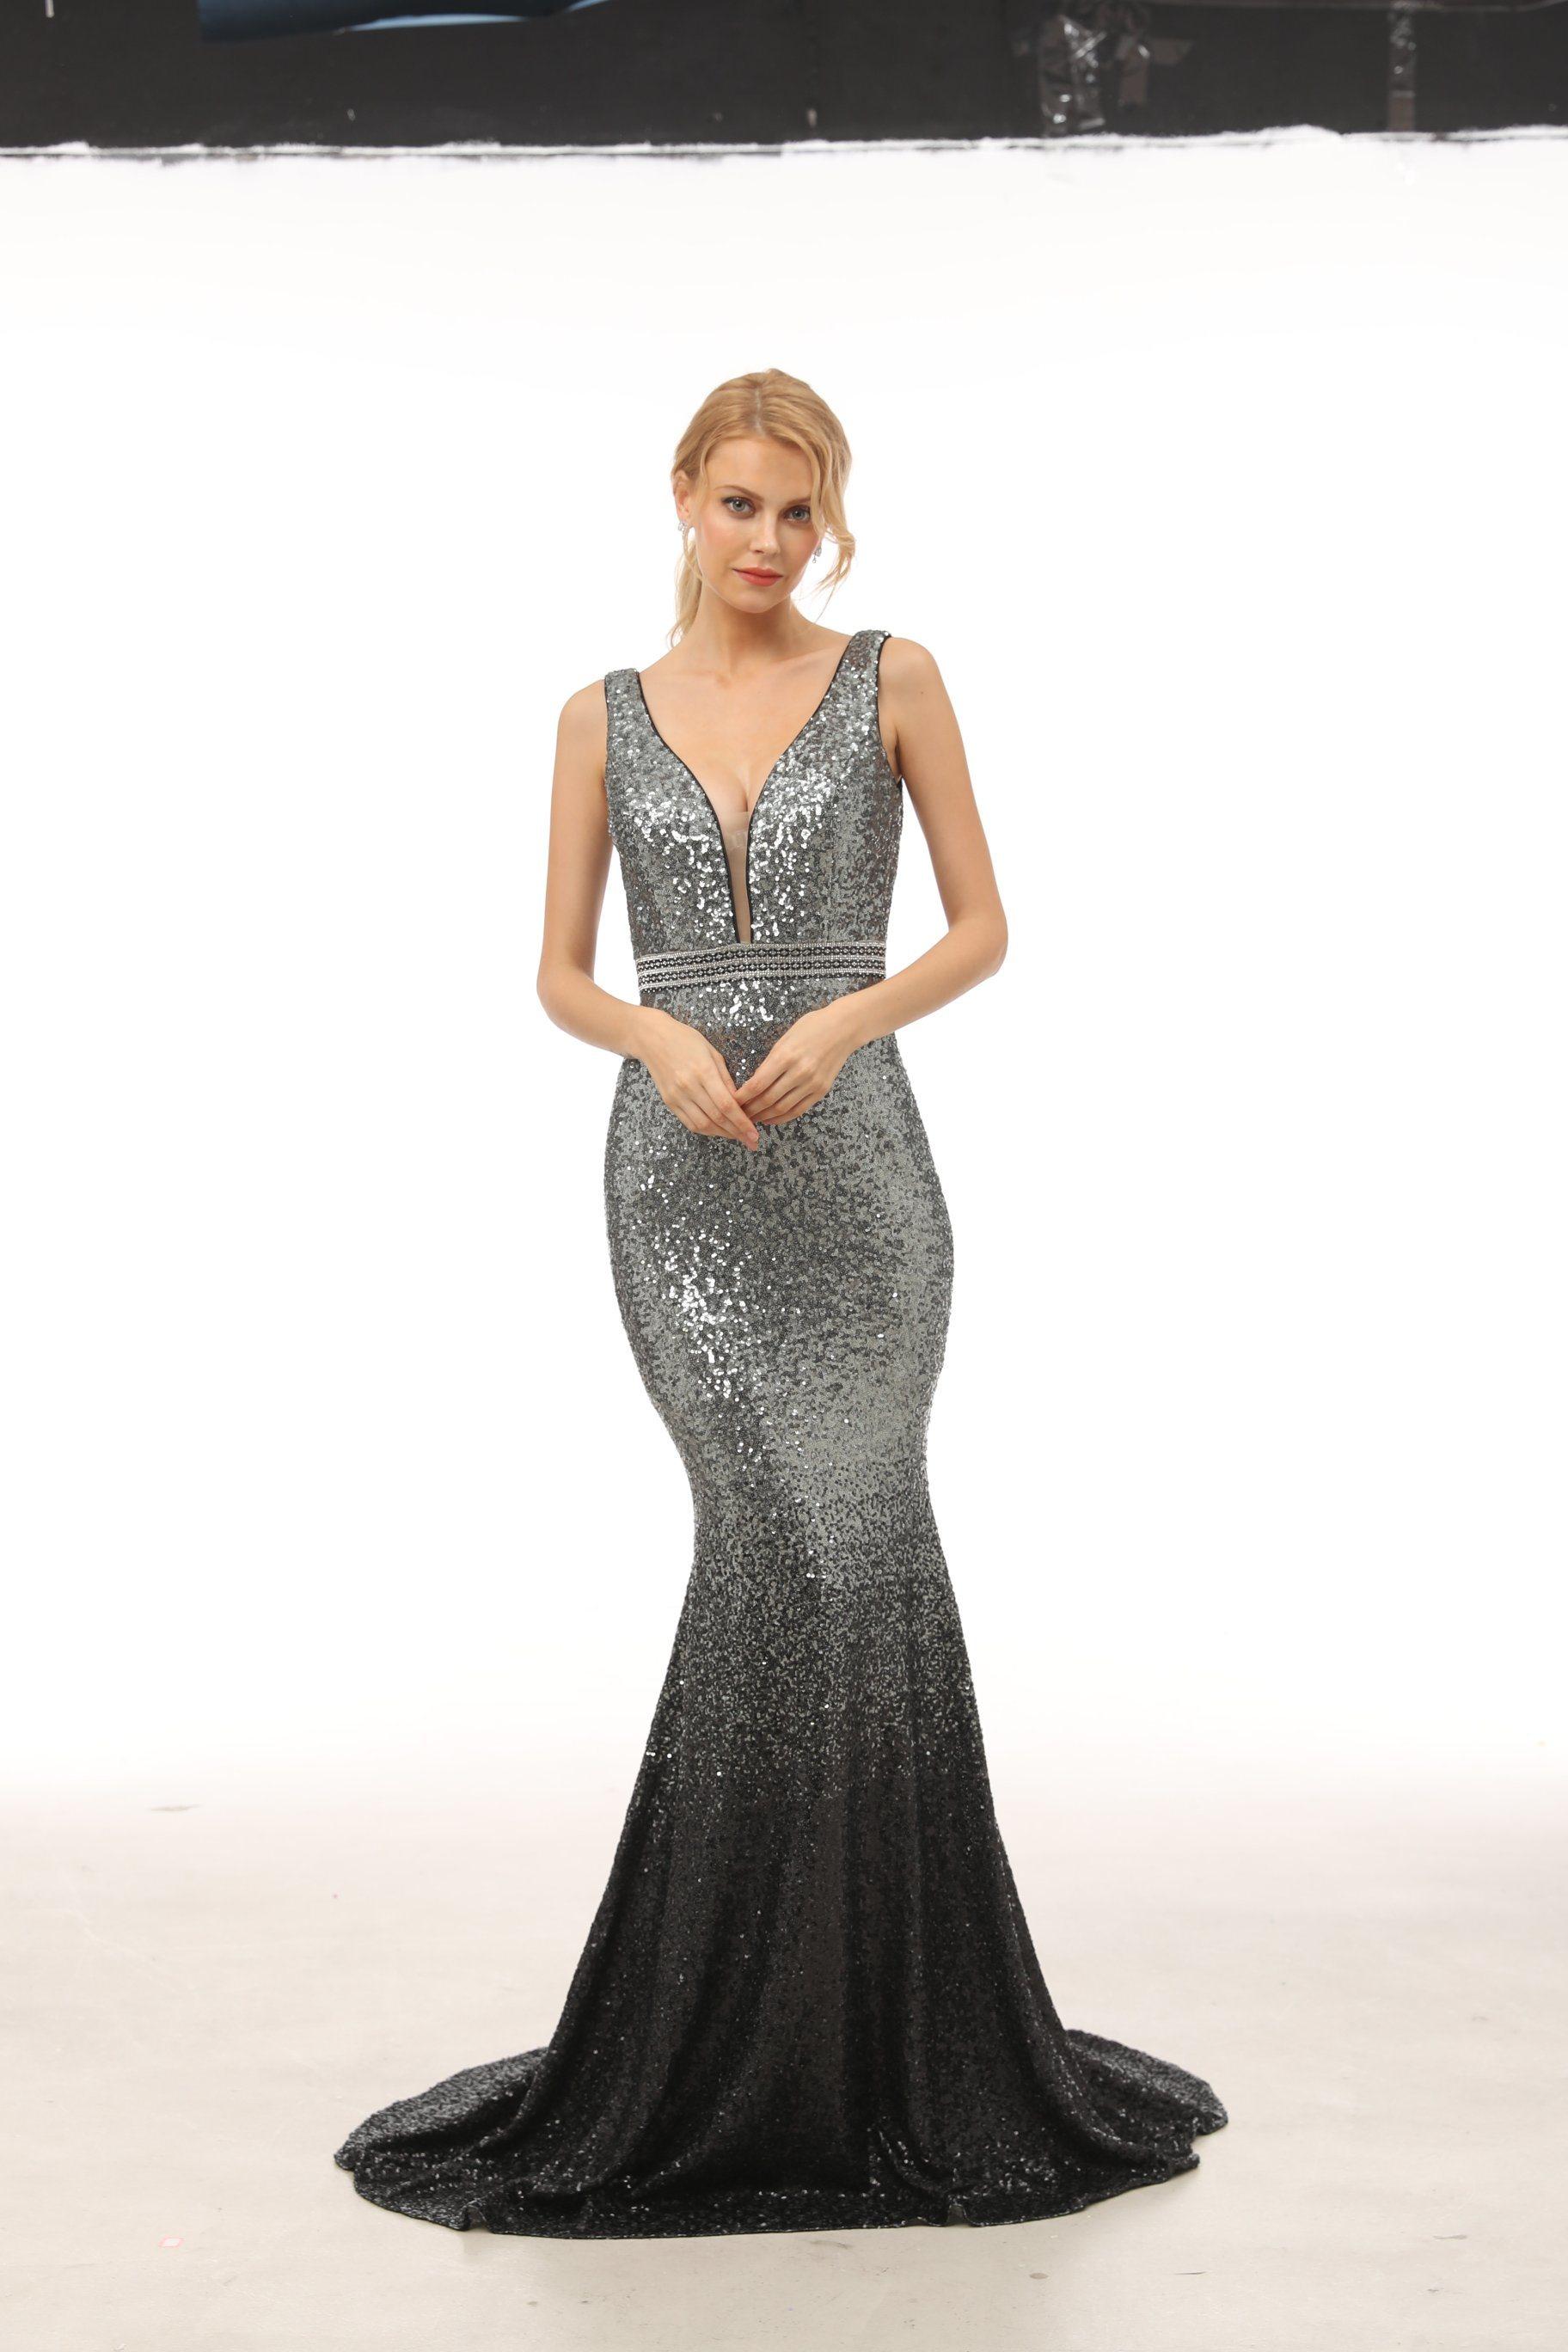 4be5a4571914 [Hot Item] Aoliweiya Diseño de Moda Vestido de Noche 2019